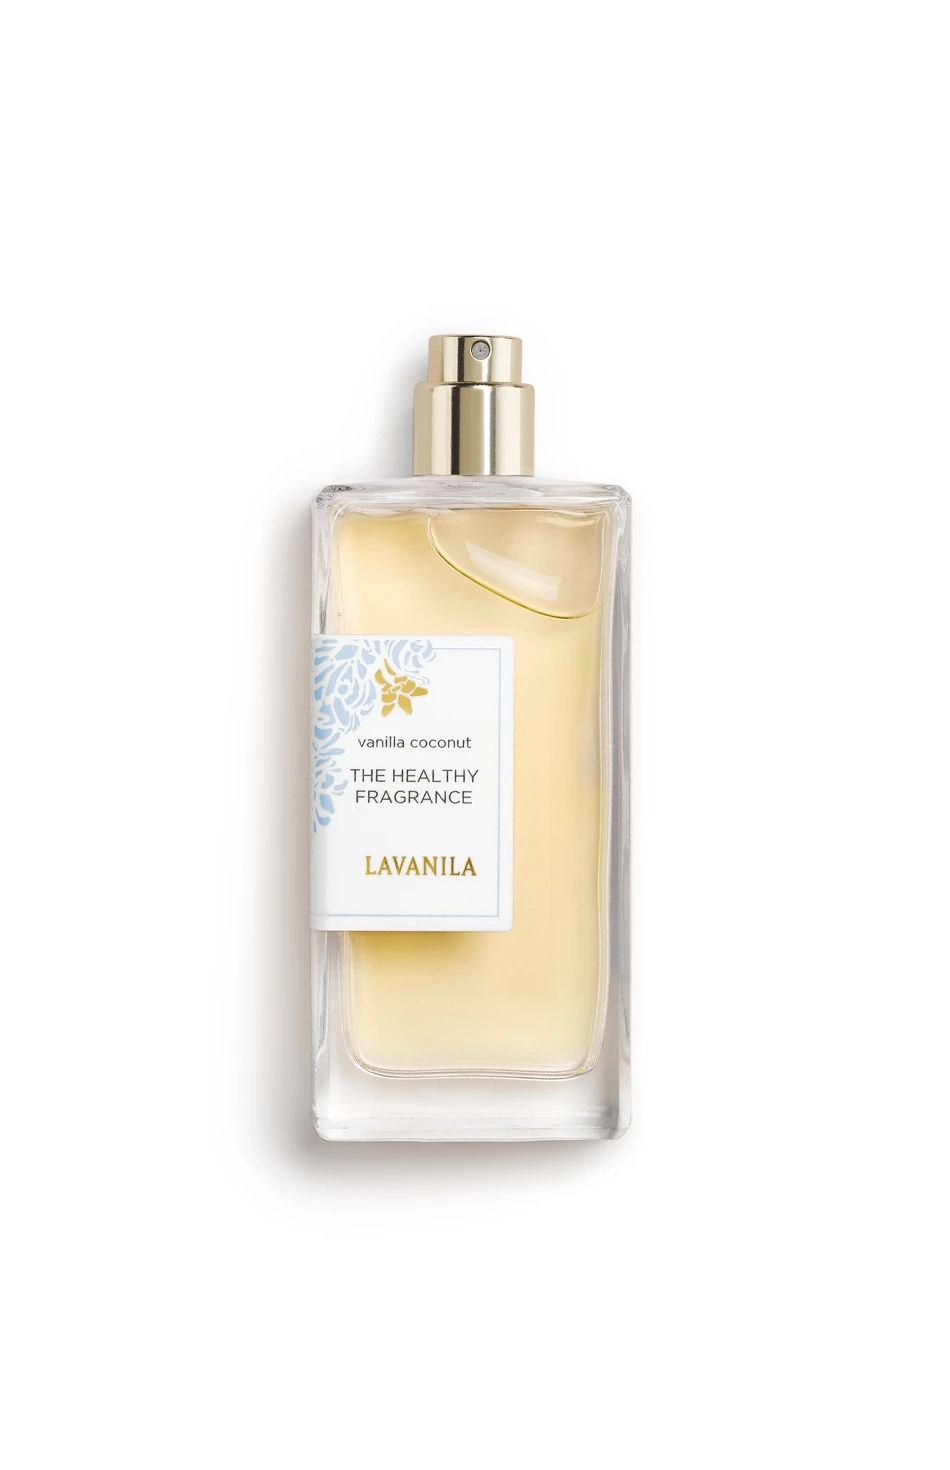 Lavanila perfume